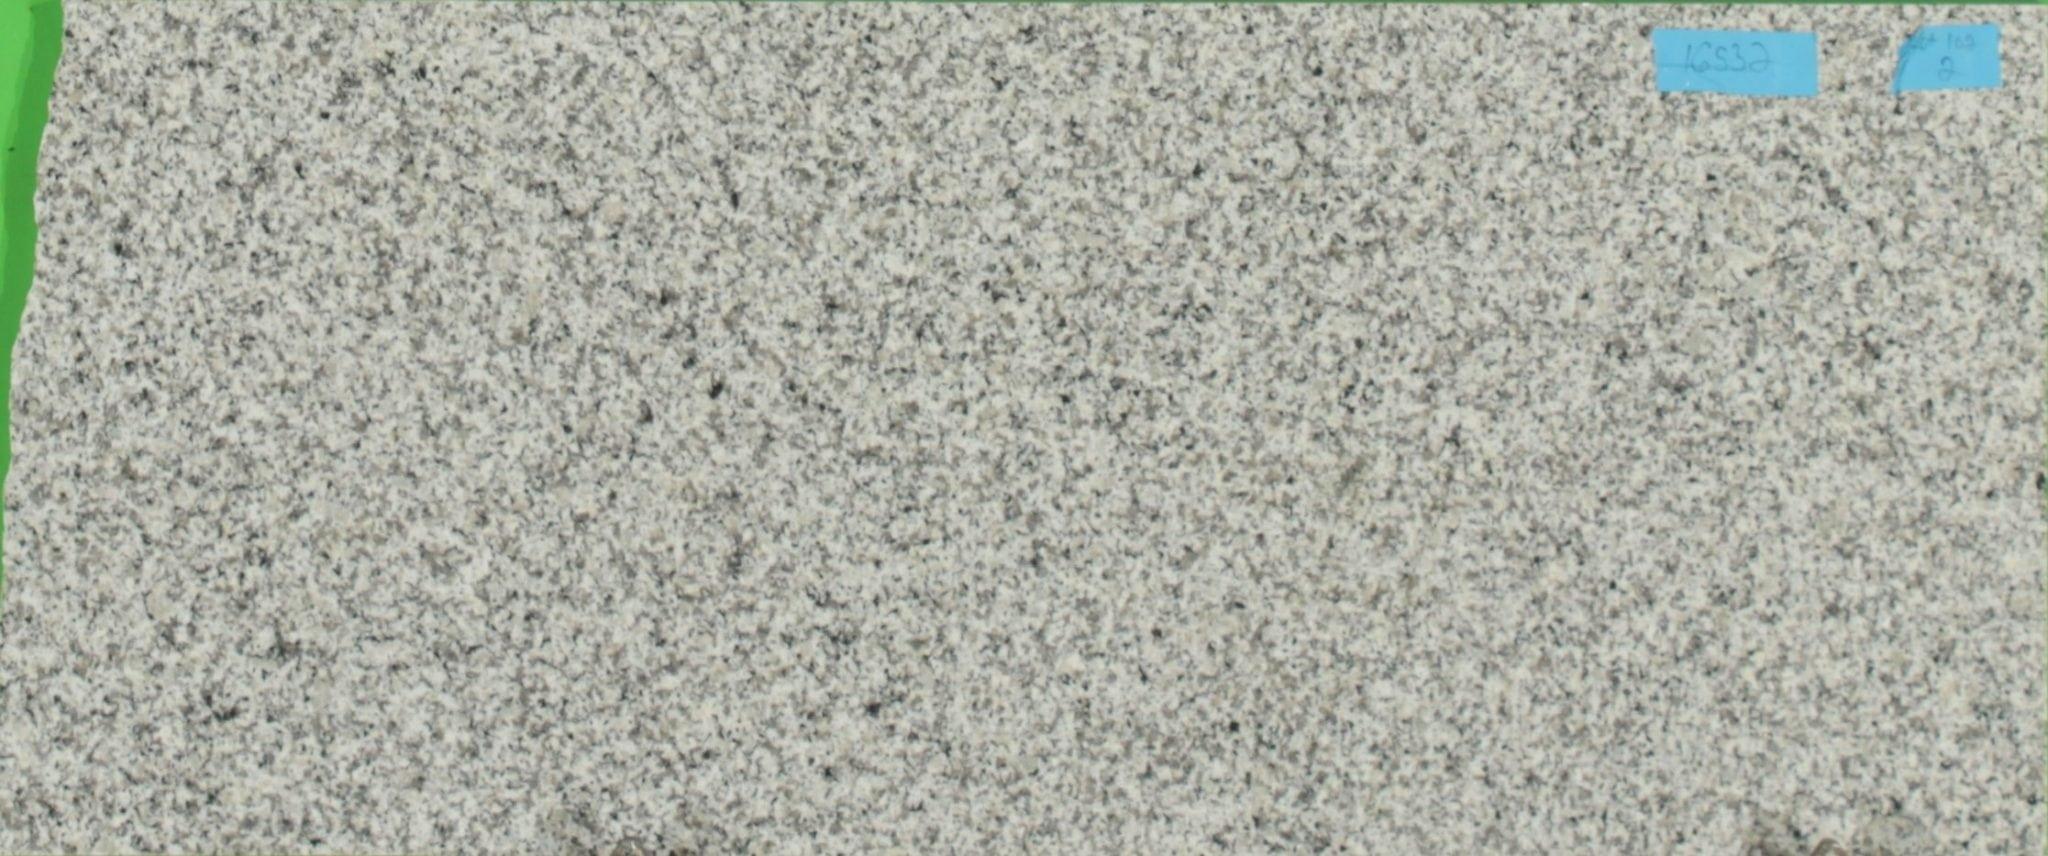 Luna Pearl - Granite Countertop Solutions Slab Inventory